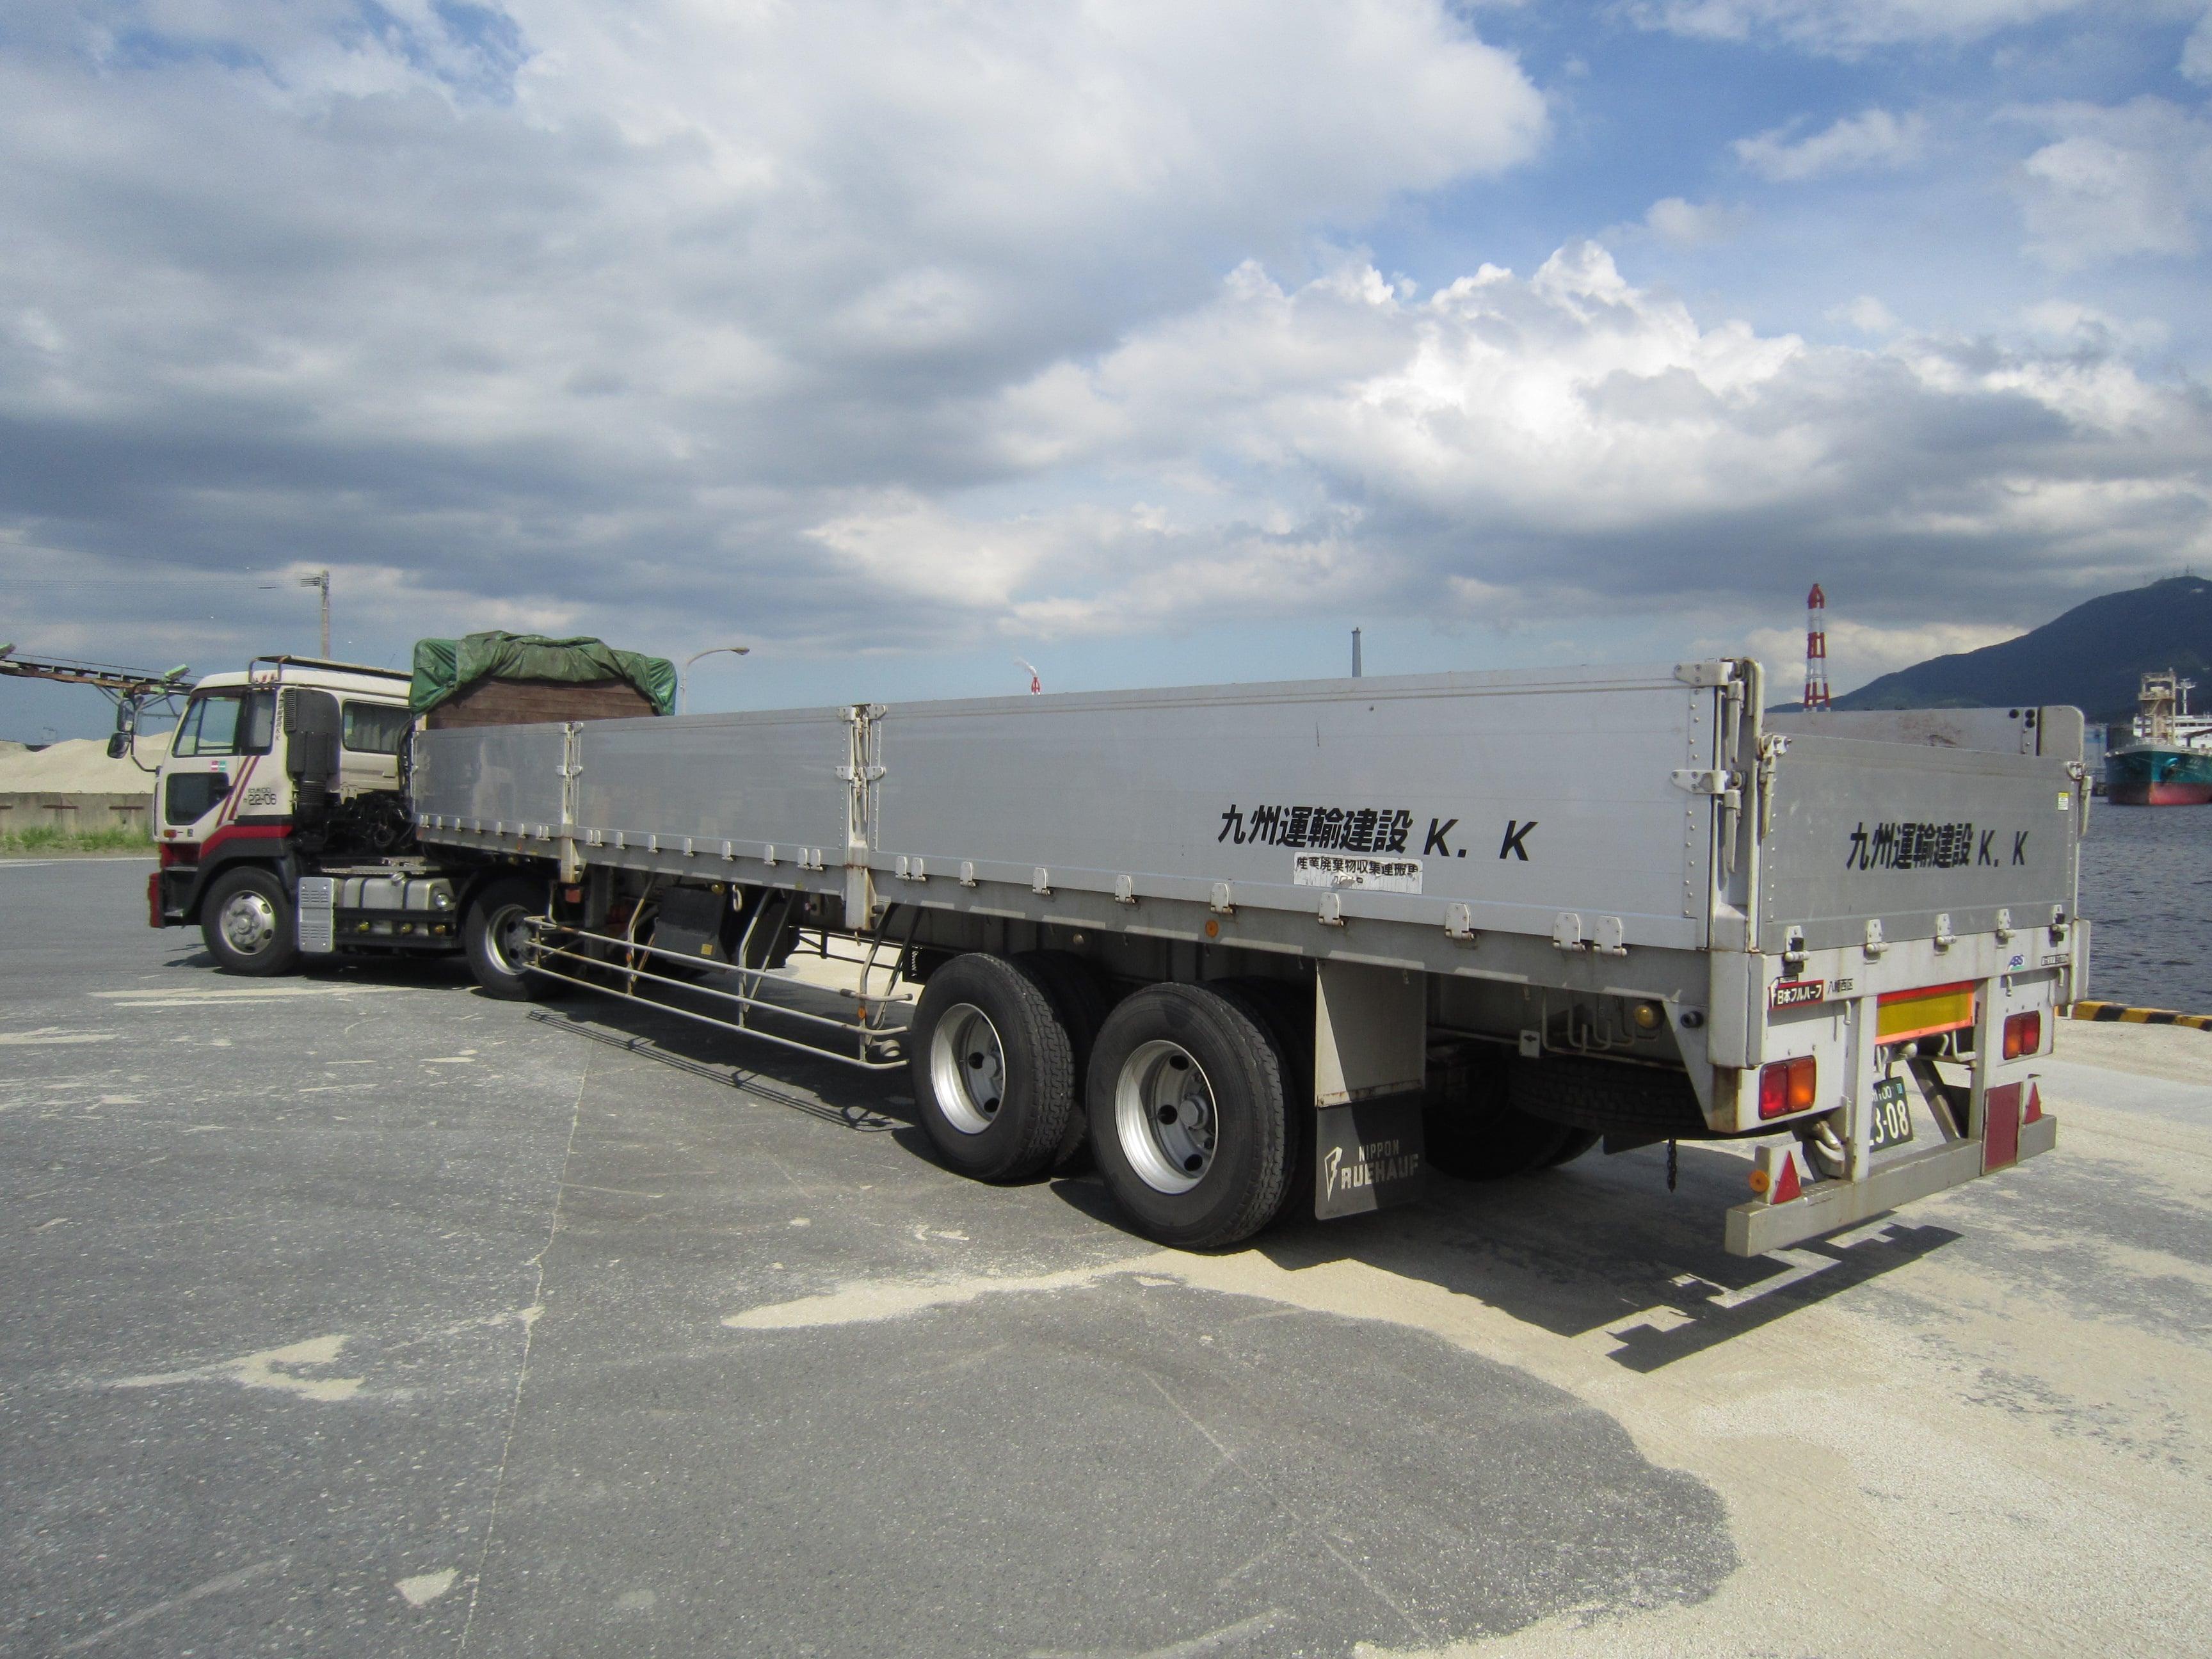 20tセミトレーラー|産業廃棄物収集運搬|九州運輸建設株式会社|北九州市